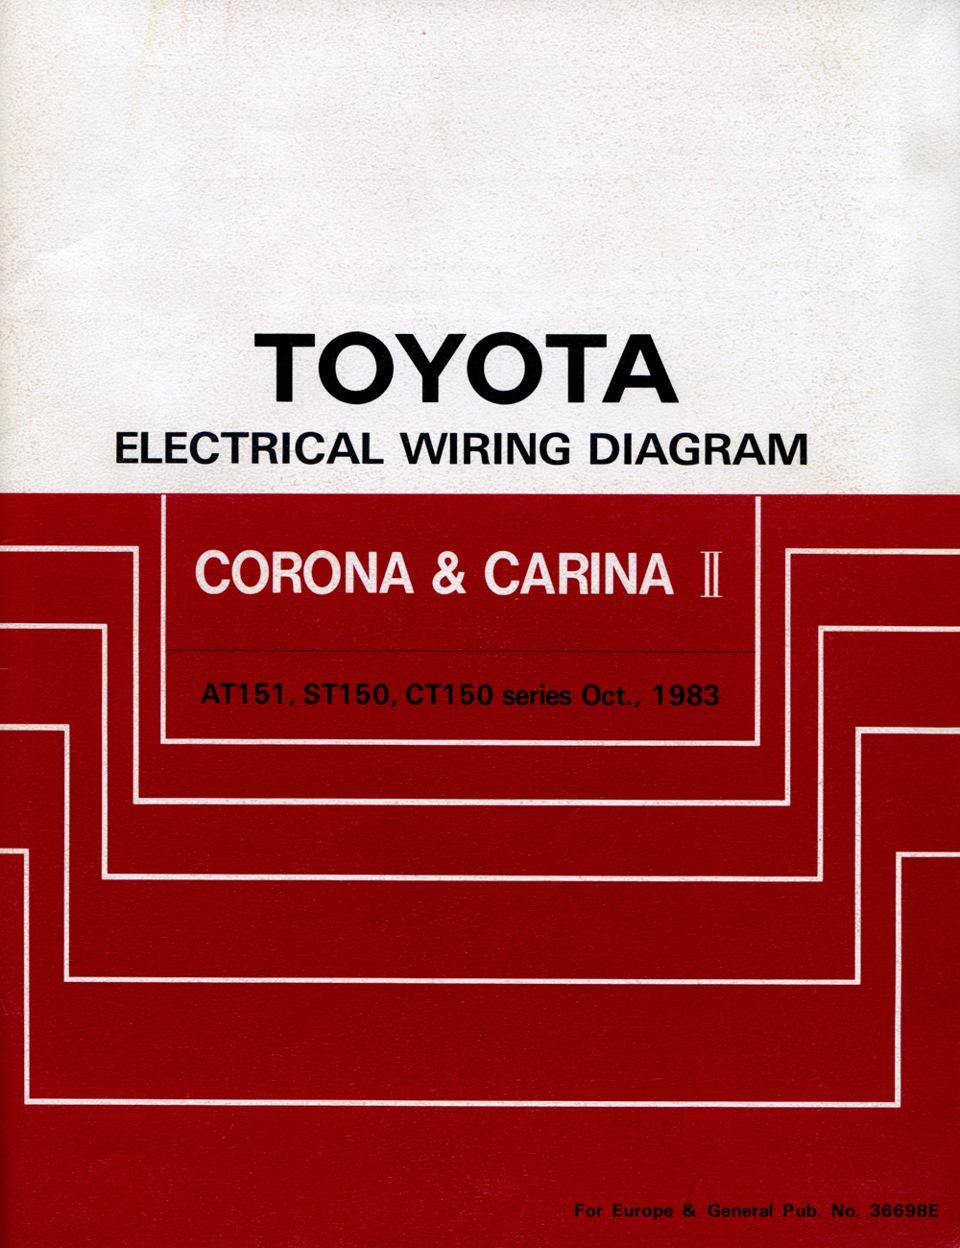 hight resolution of toyota carina 2 wiring diagram